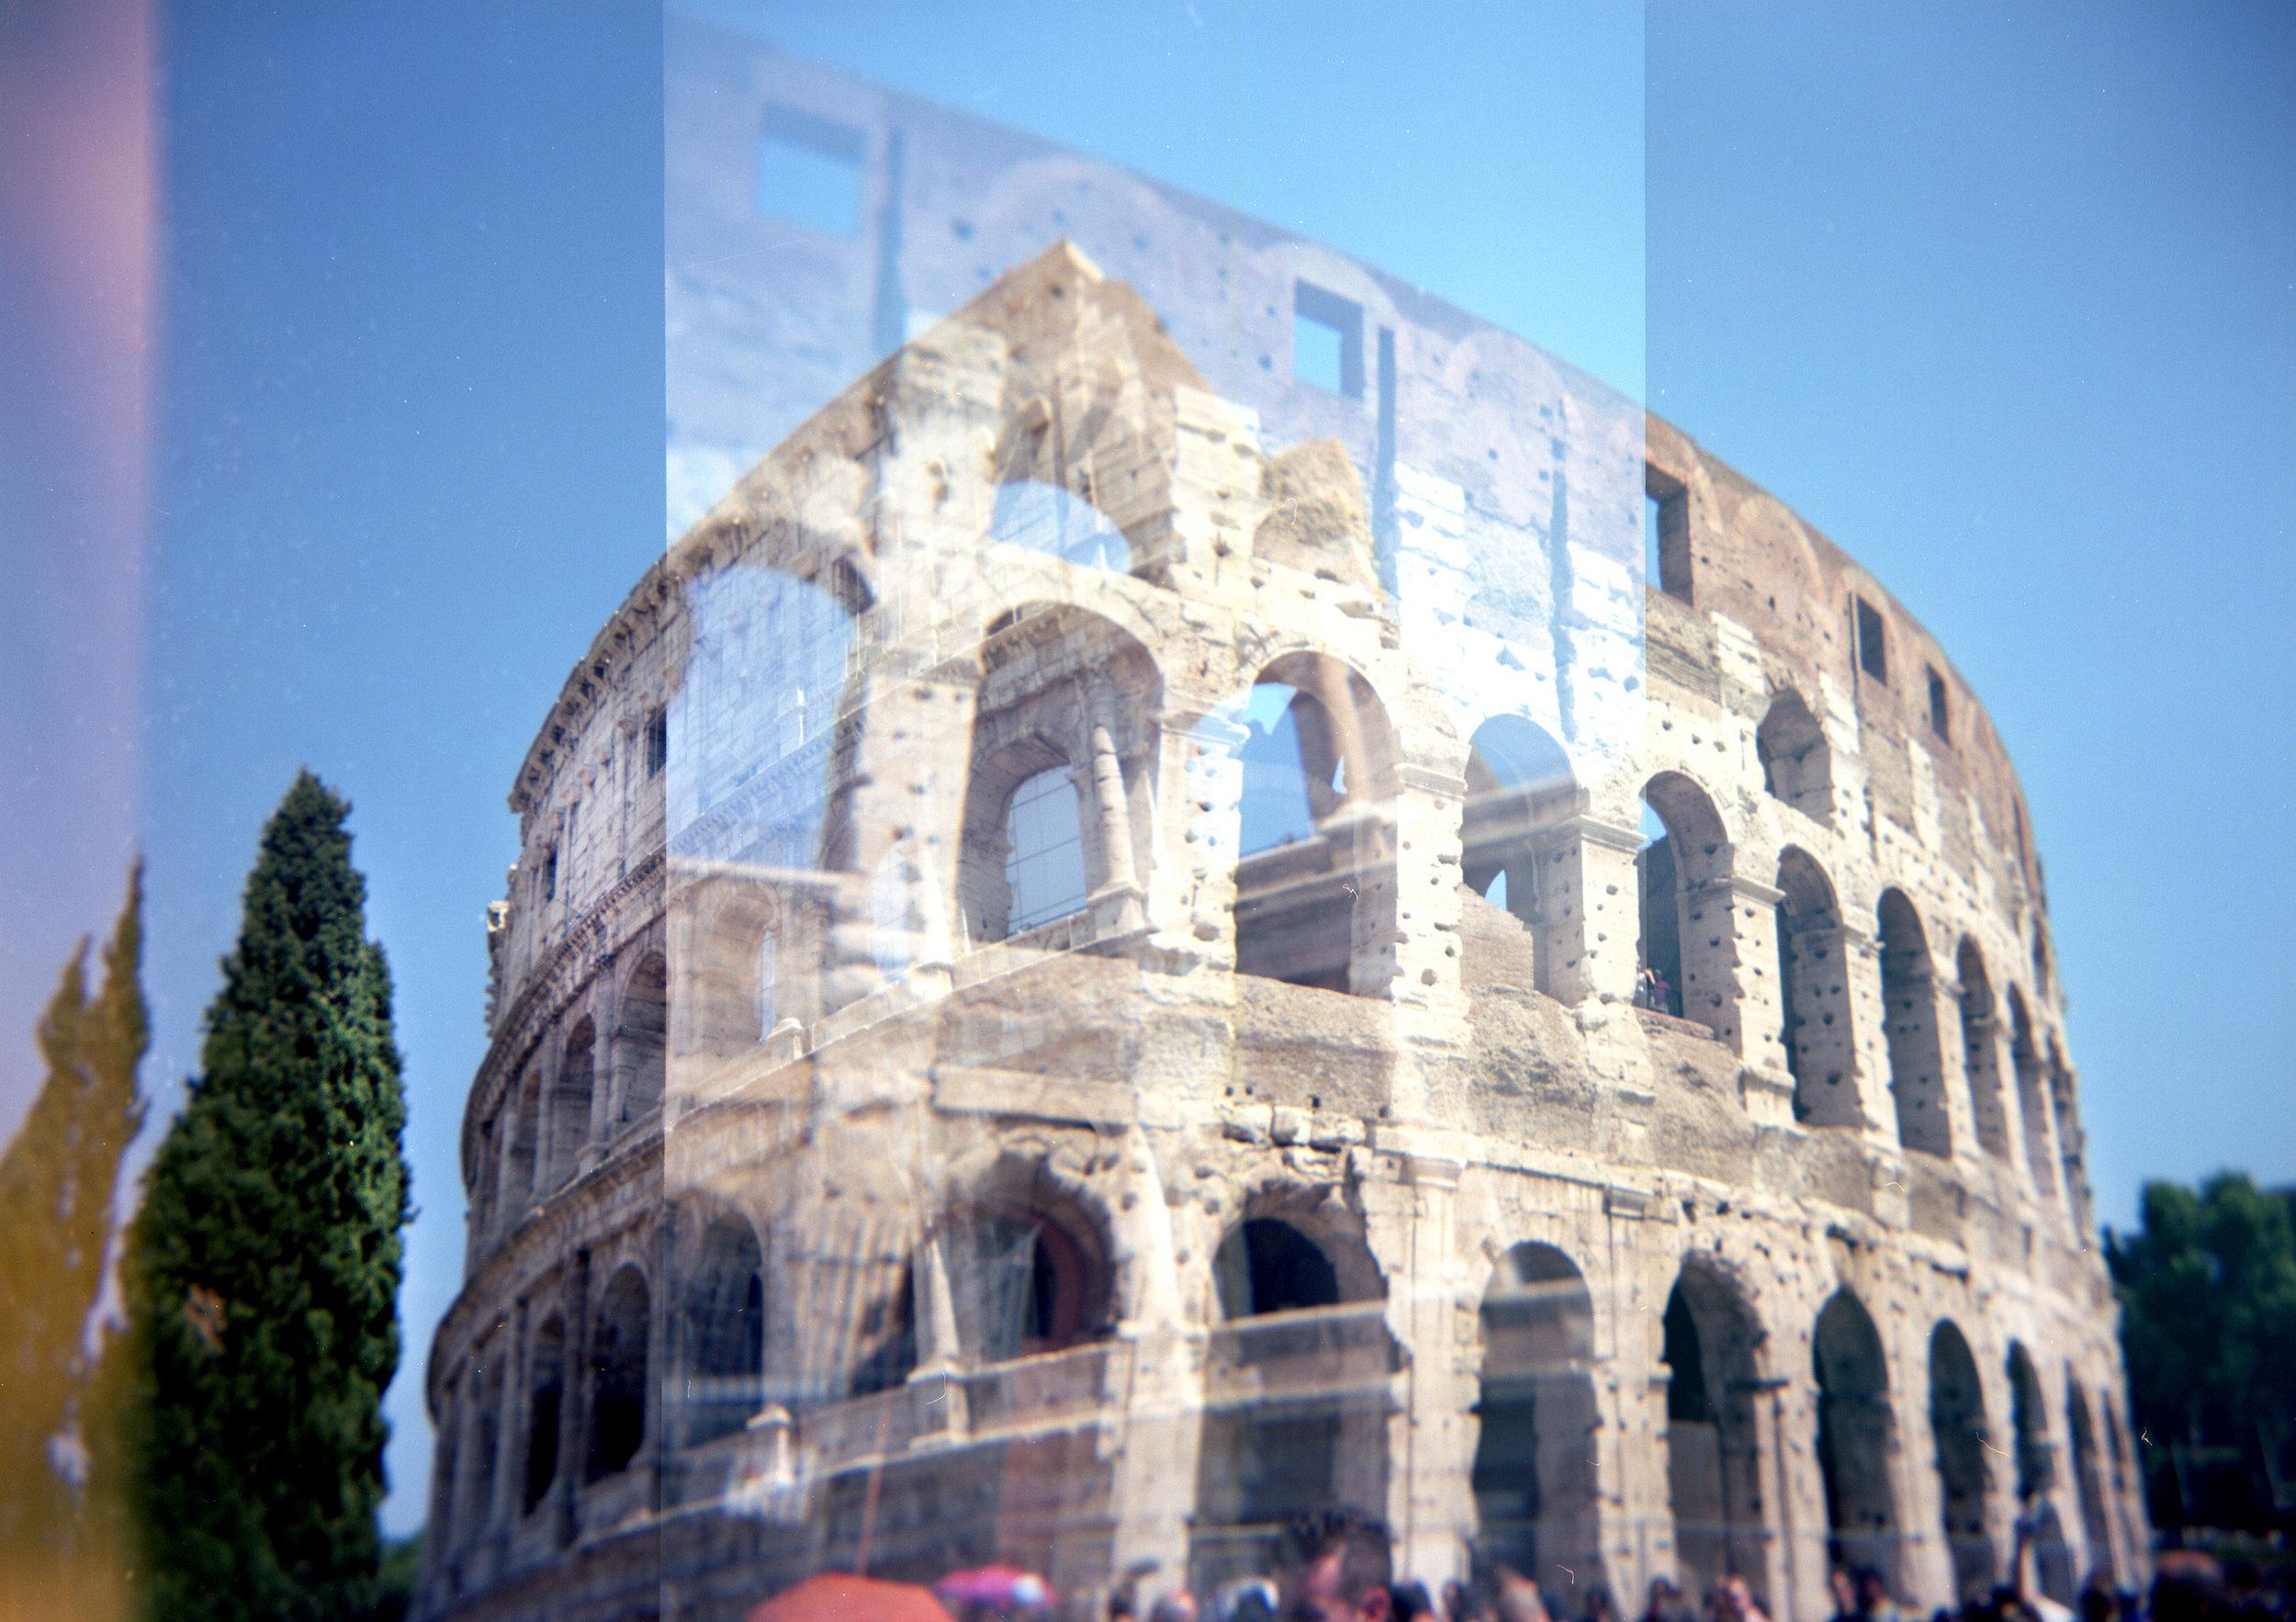 Italy026.jpg